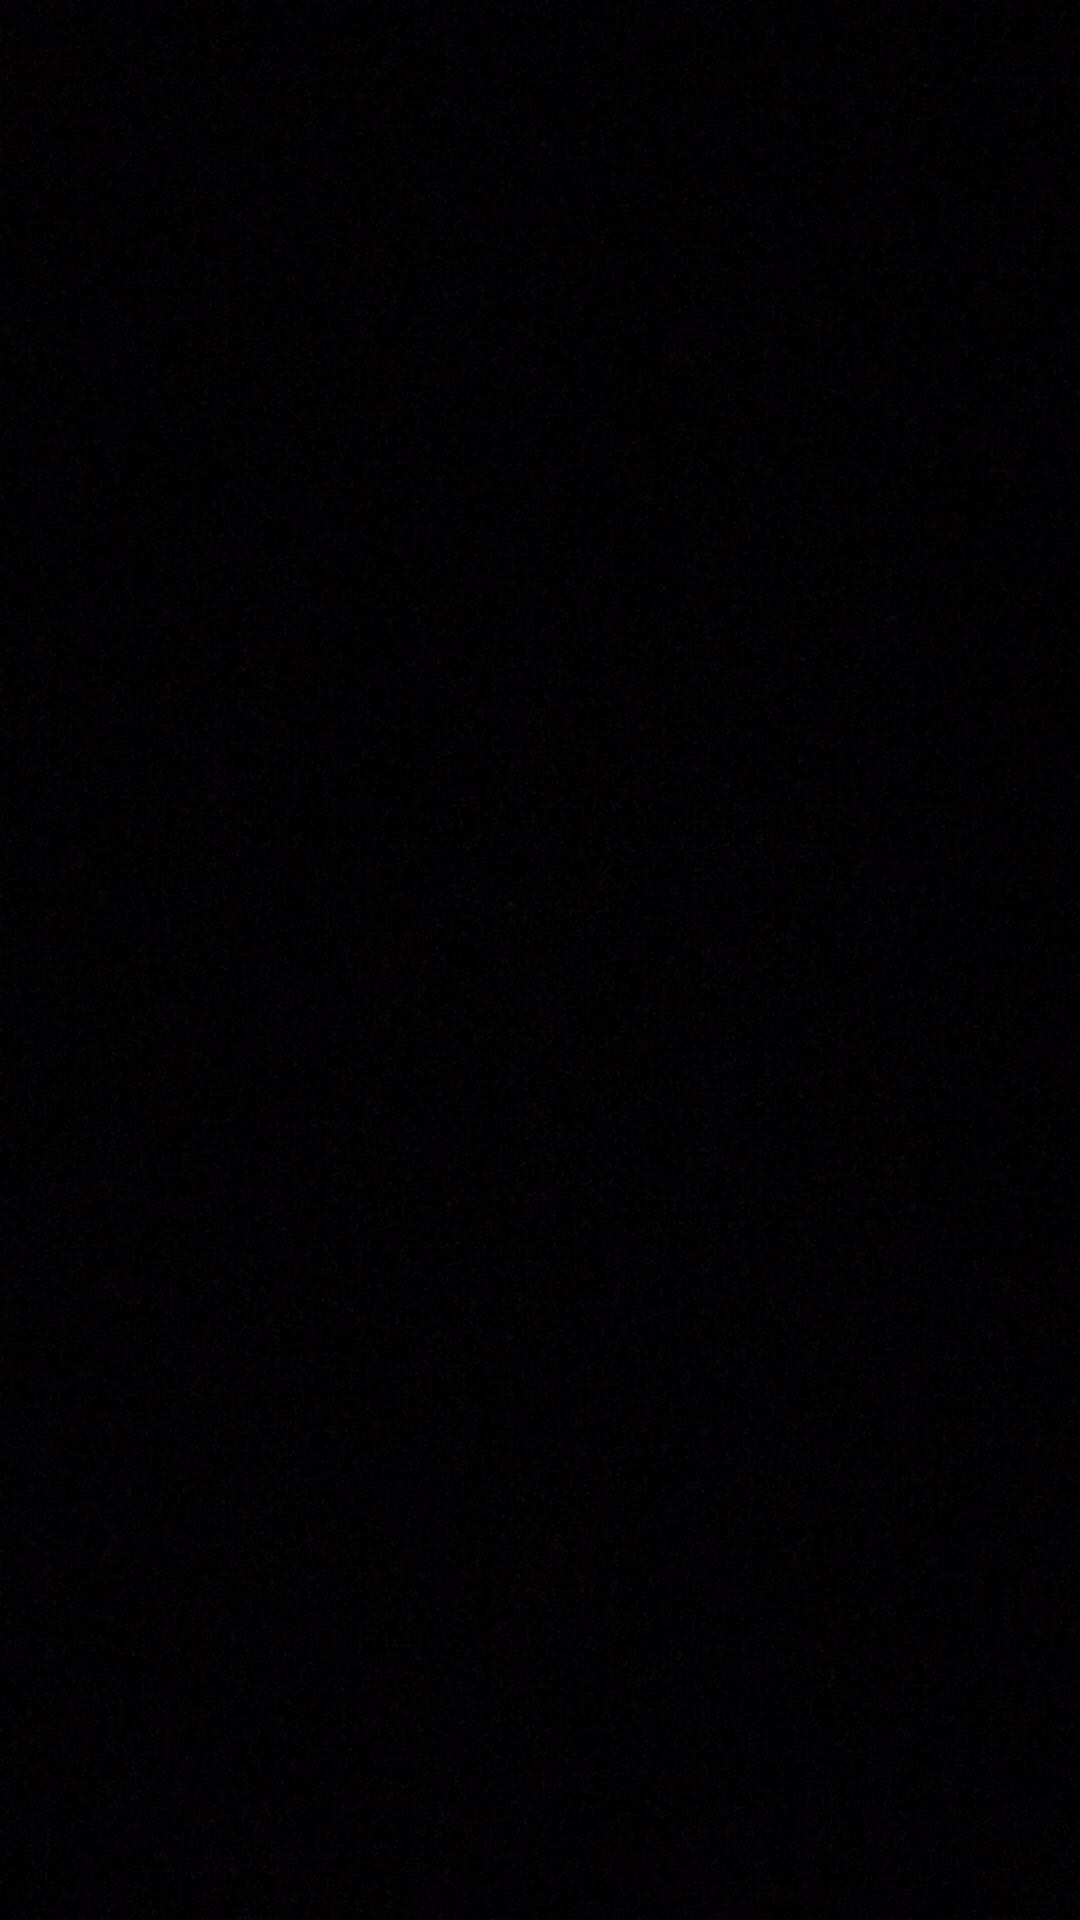 mens nike shox nz dark grey/total orange 00297606 women